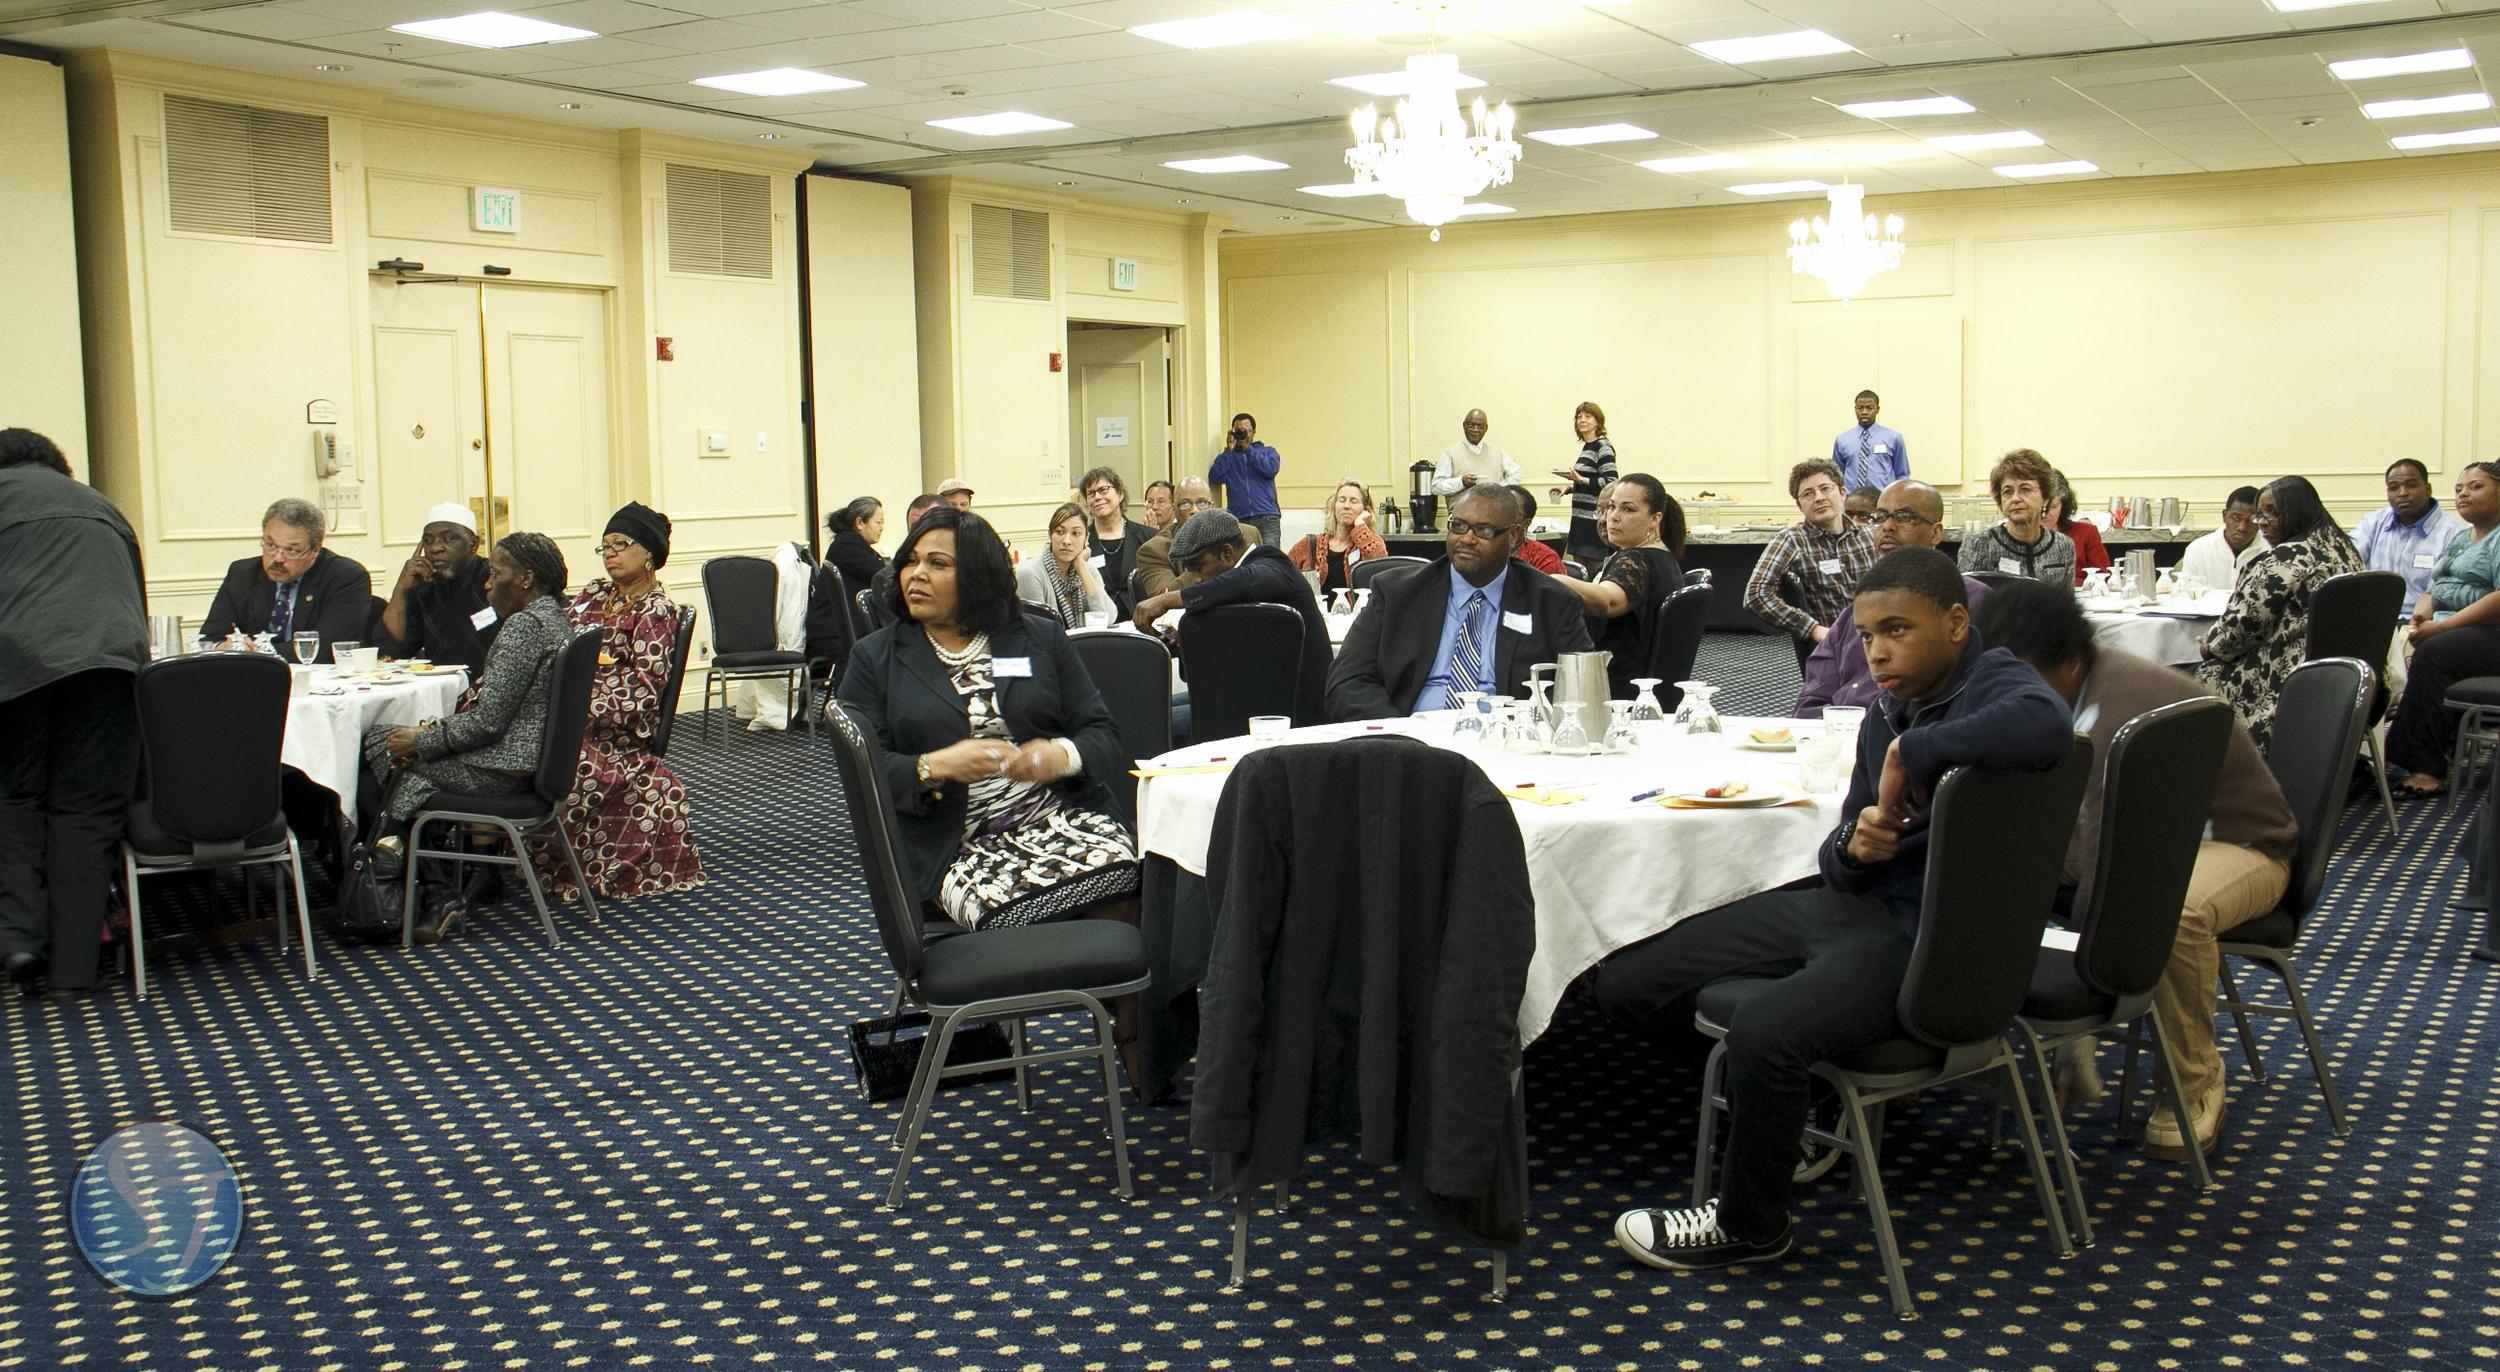 conventionparticipants-56.jpg